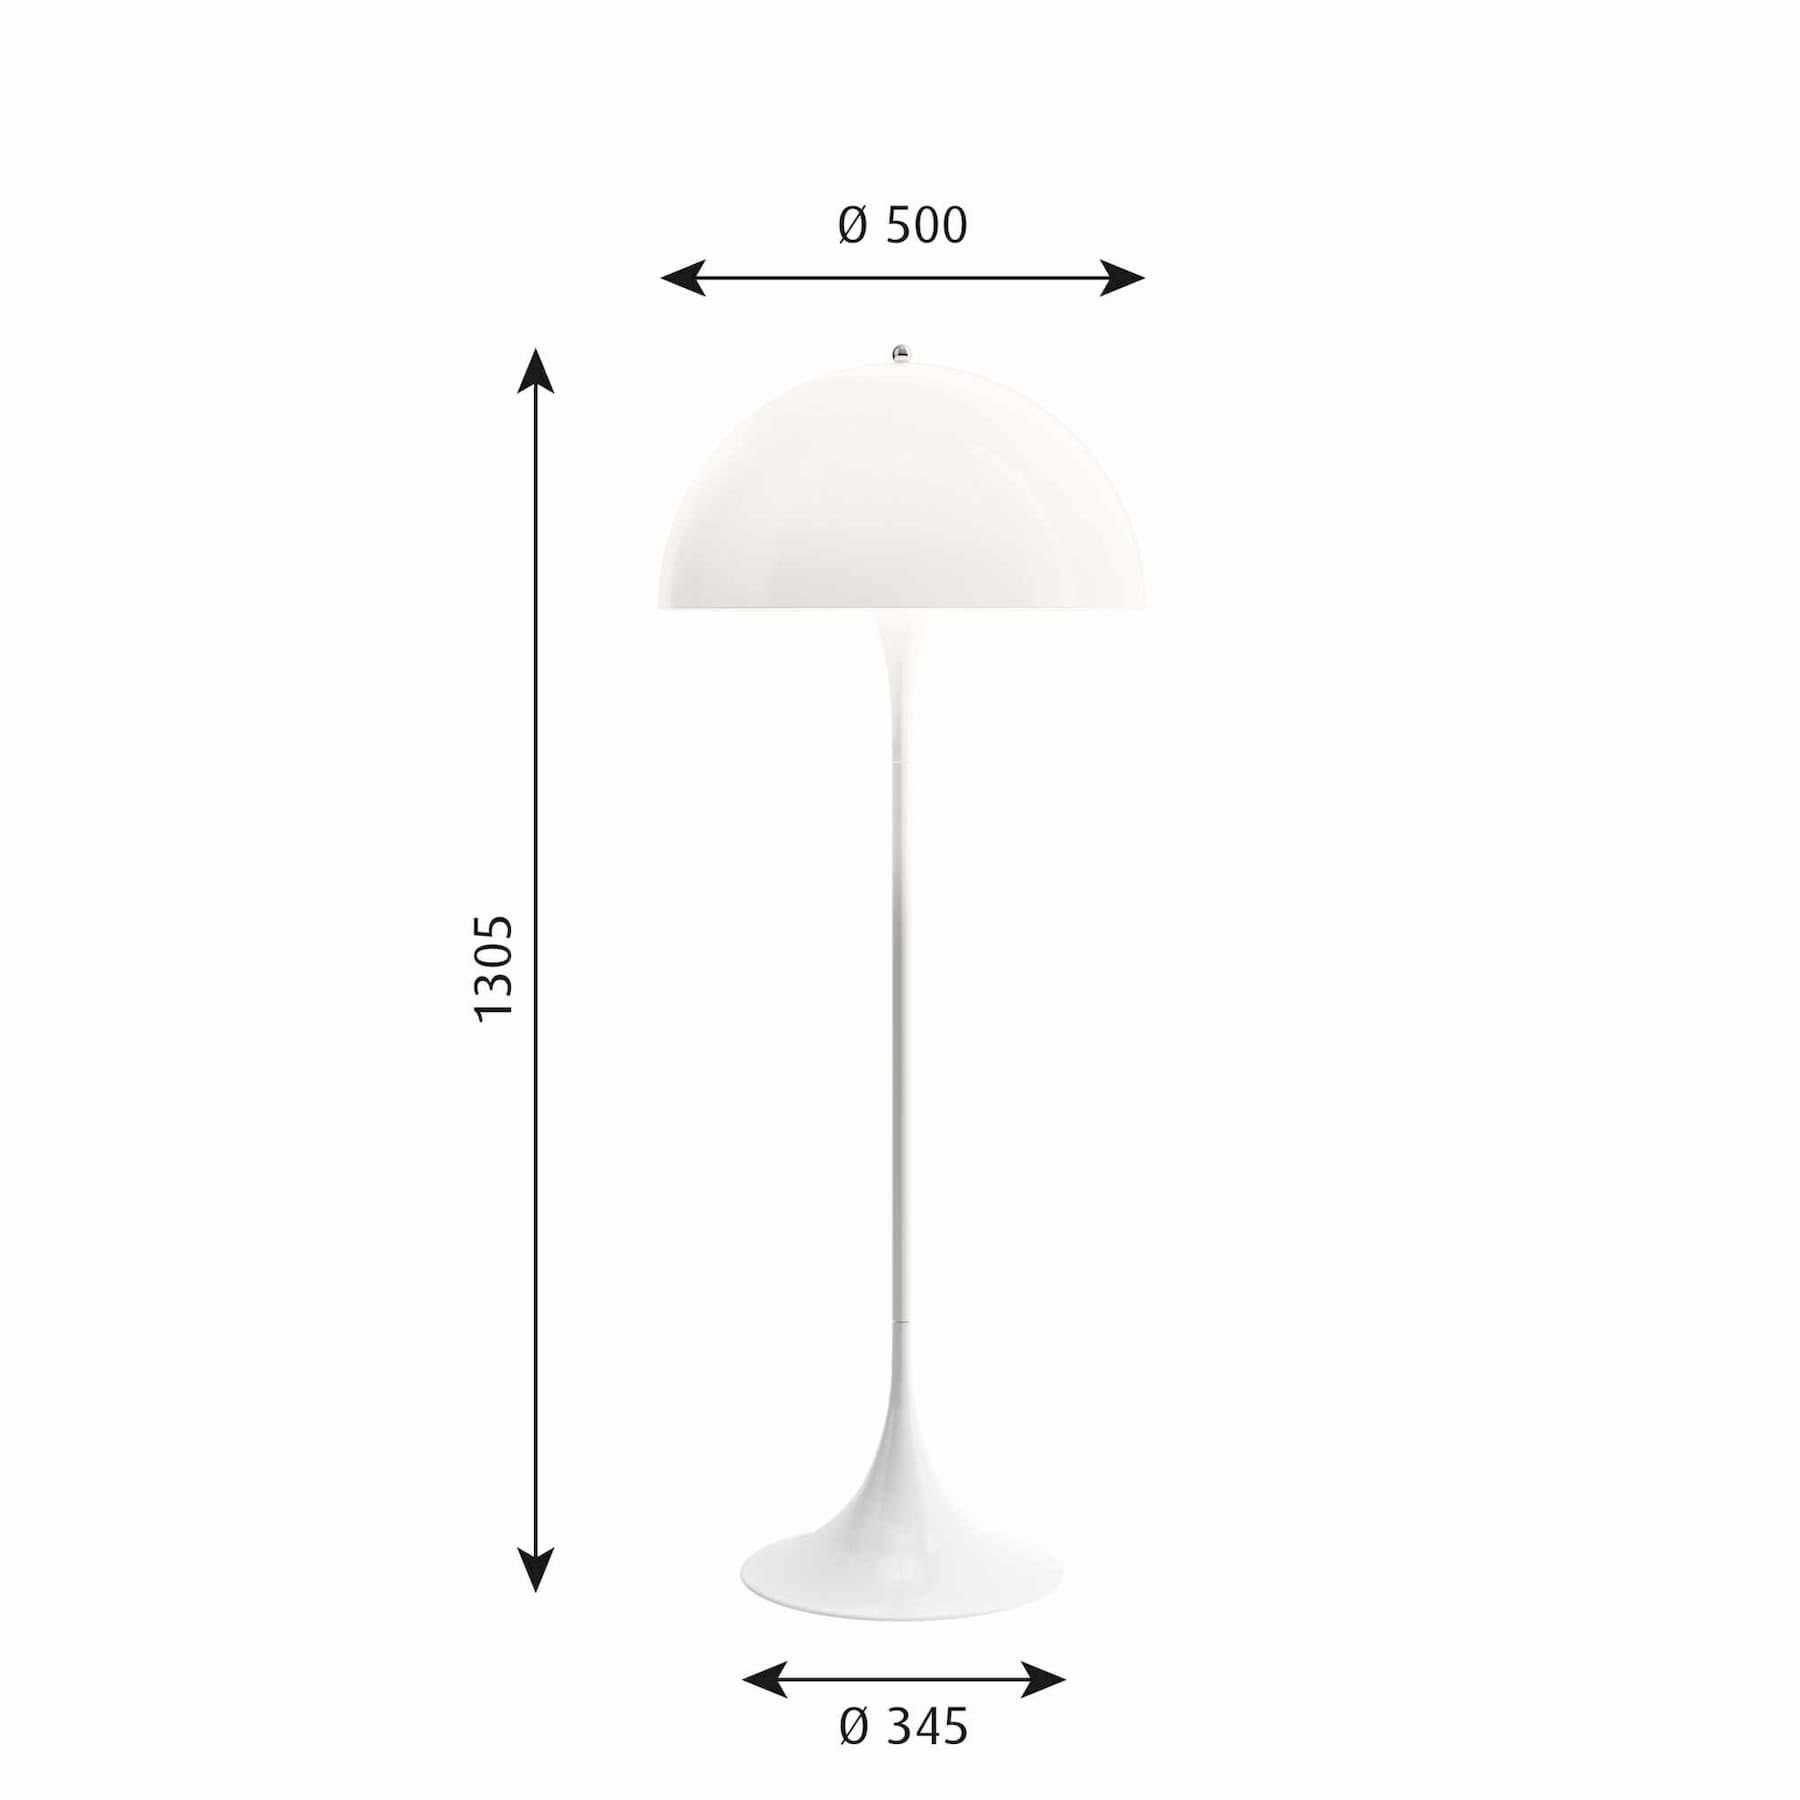 louis-poulsen-panthella-lamp-dimensions